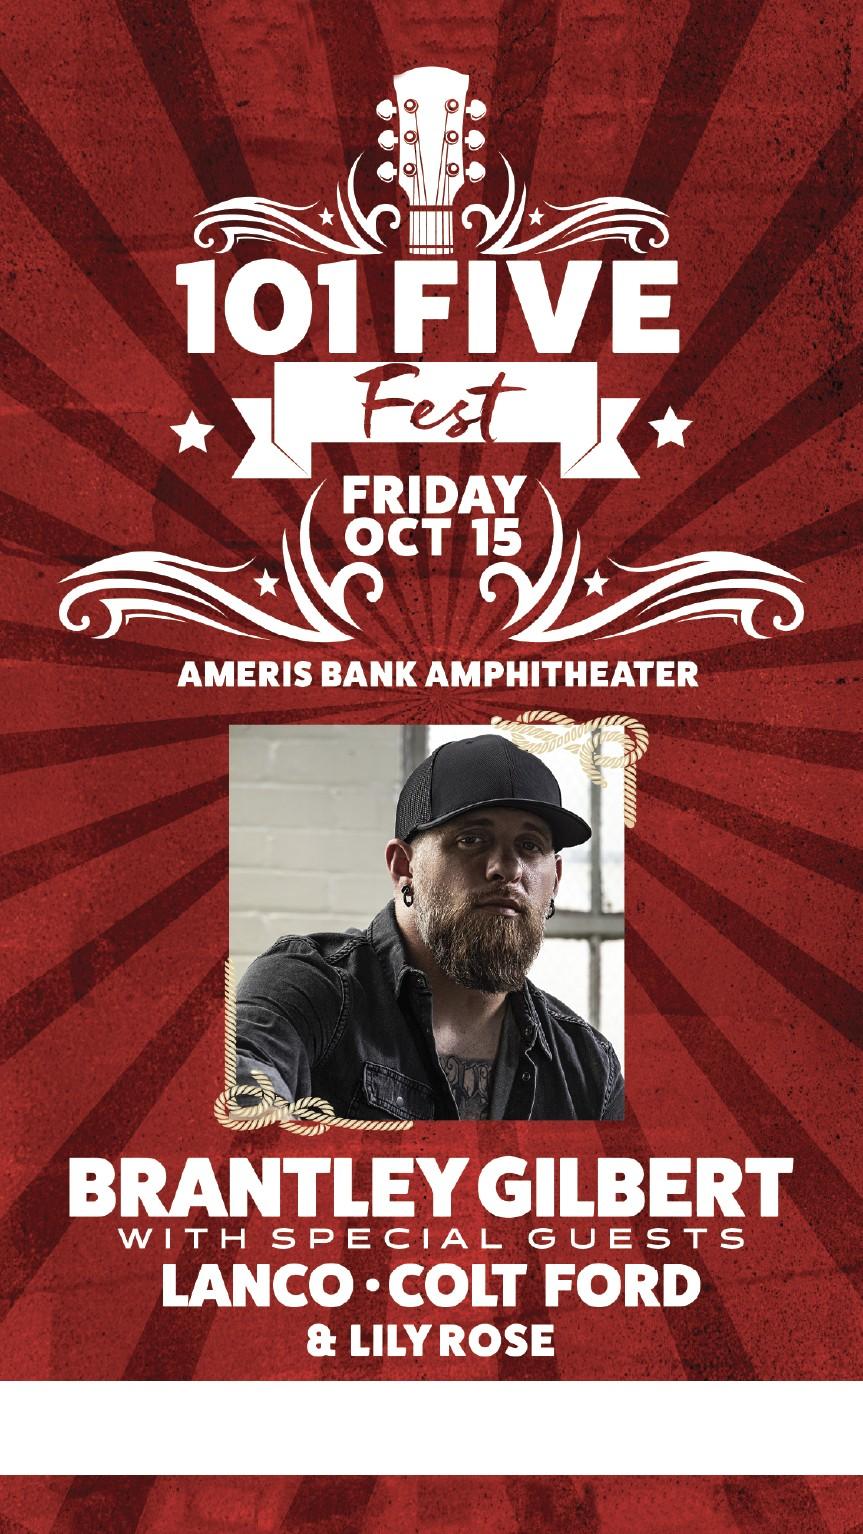 Oct. 15th, Brantley Gilbert/Lanco @ Ameris Bank